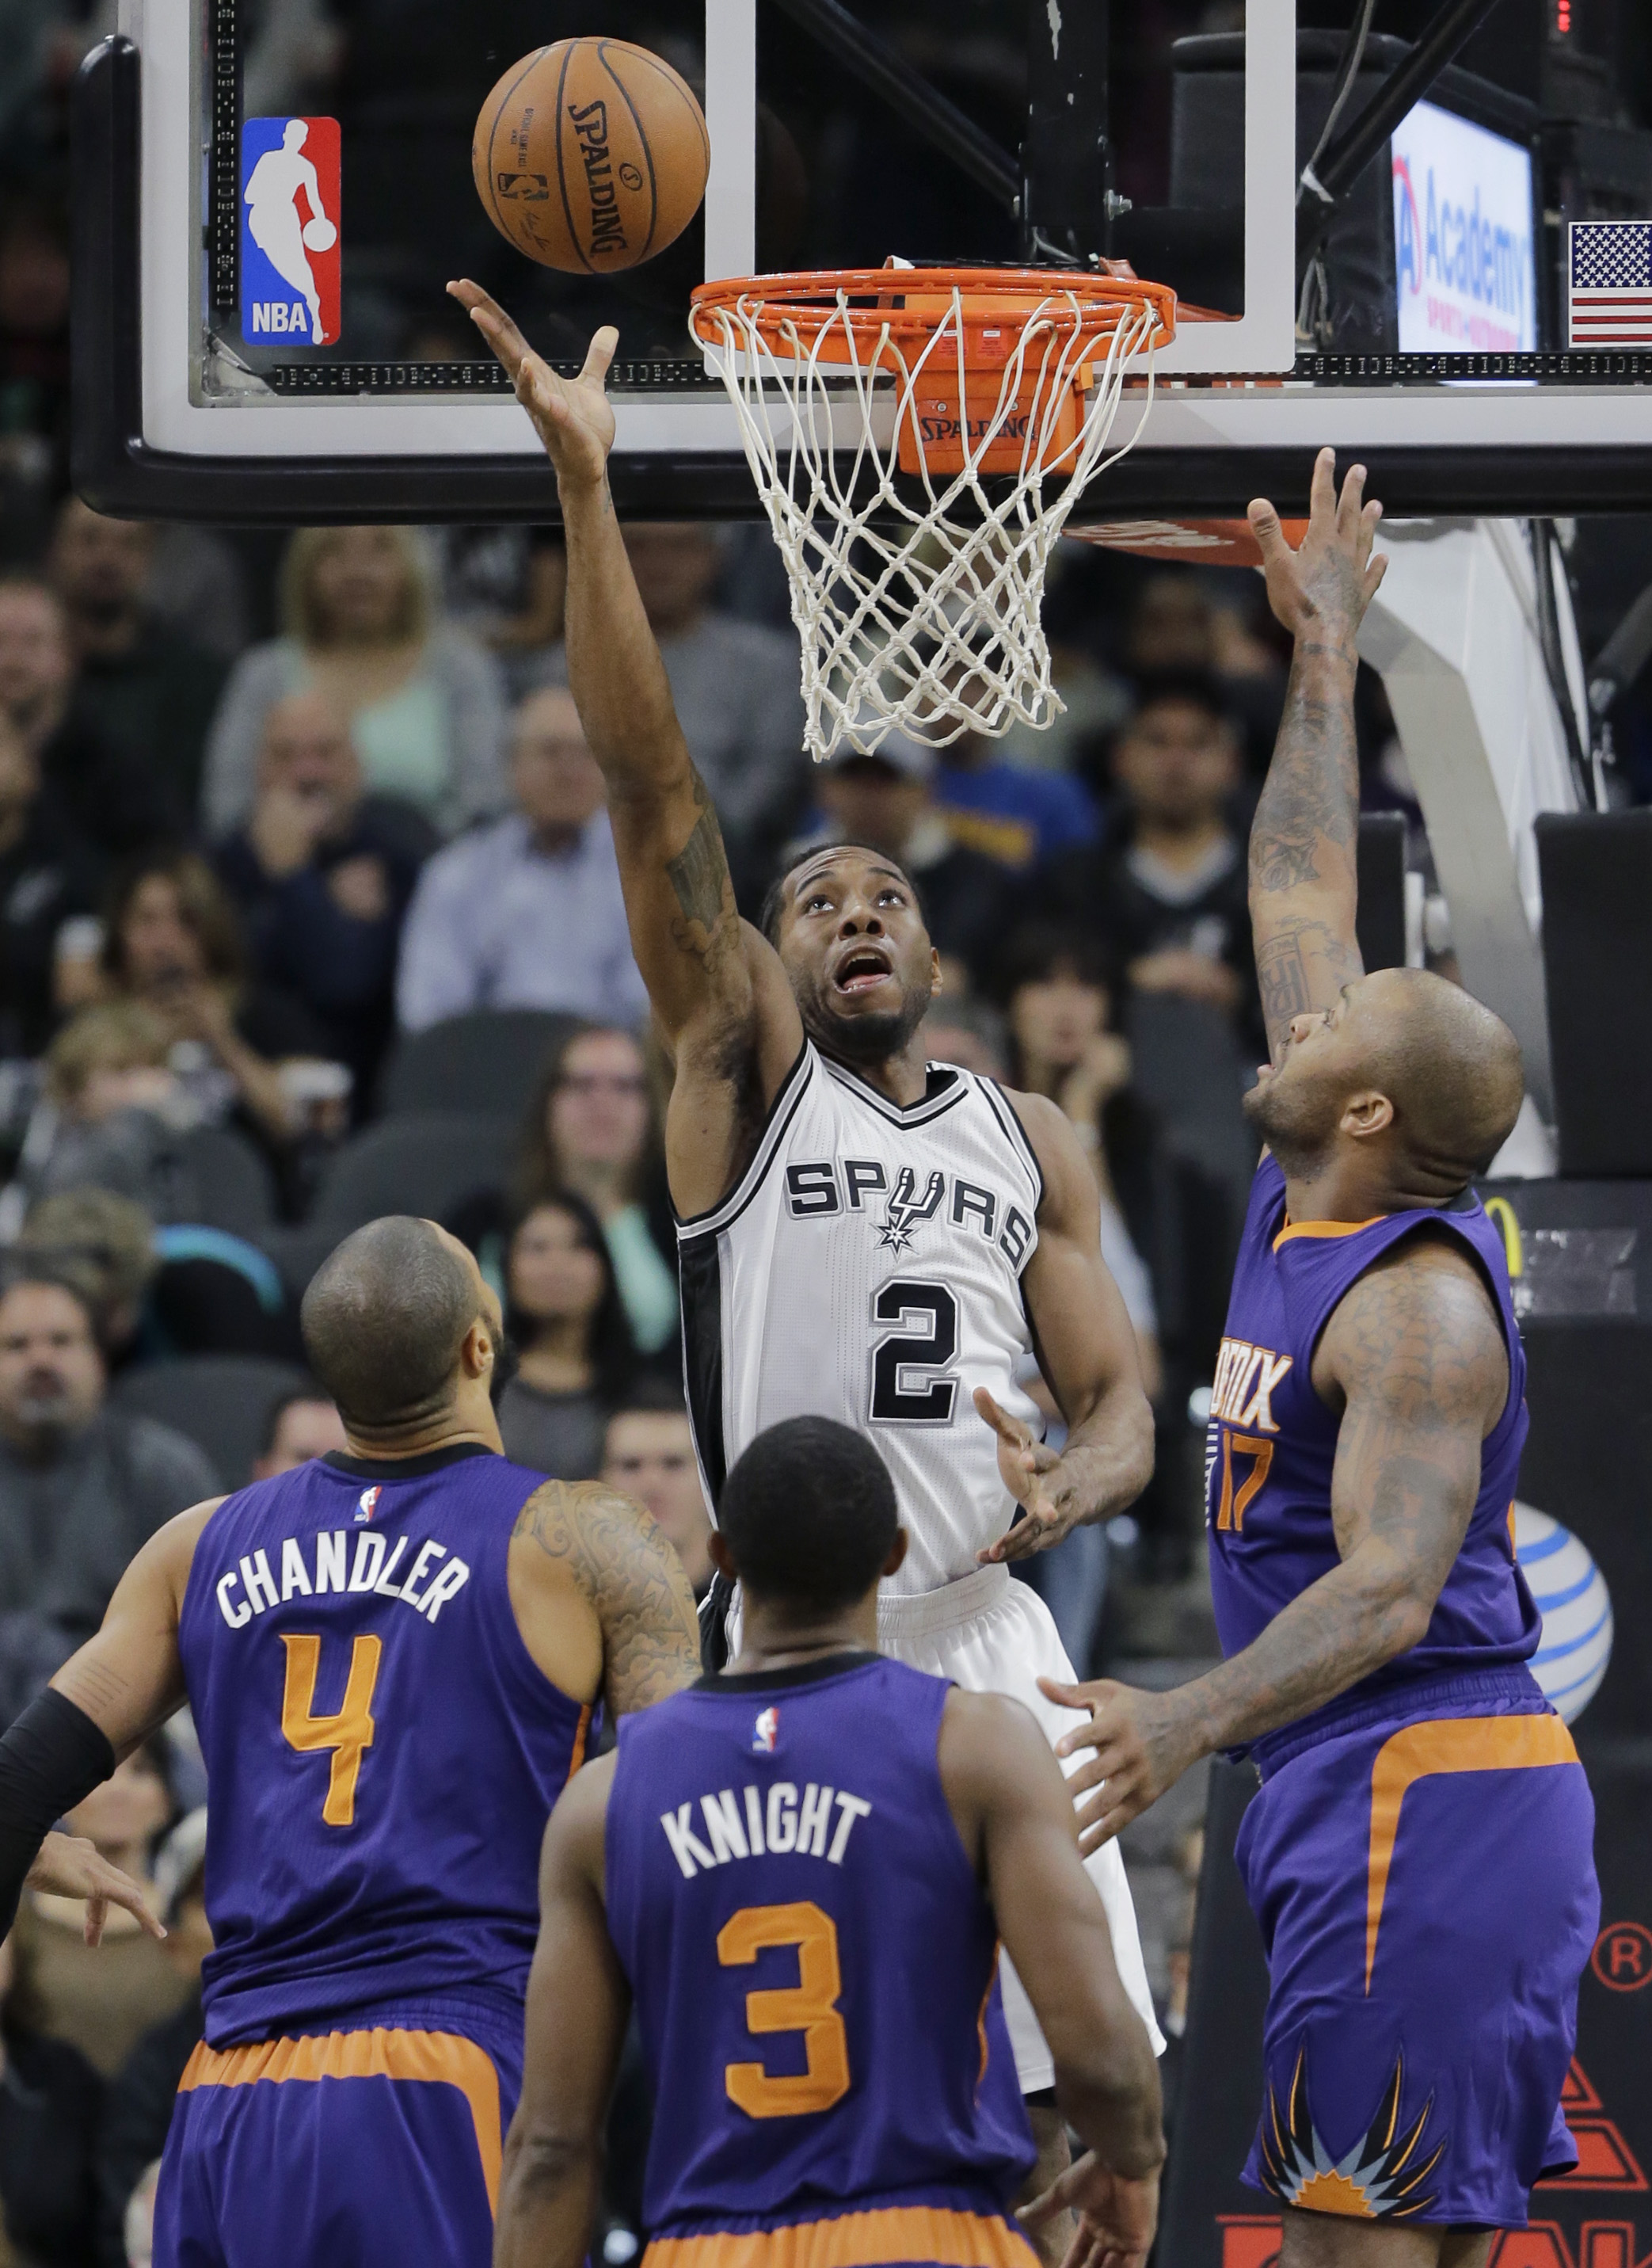 San Antonio Spurs' Kawhi Leonard (2) scores over Phoenix Suns defenders Tyson Chandler (4), Brandon Knight (3) and P.J. Tucker (17) during the first half of an NBA basketball game, Monday, Nov. 23, 2015, in San Antonio. (AP Photo/Eric Gay)